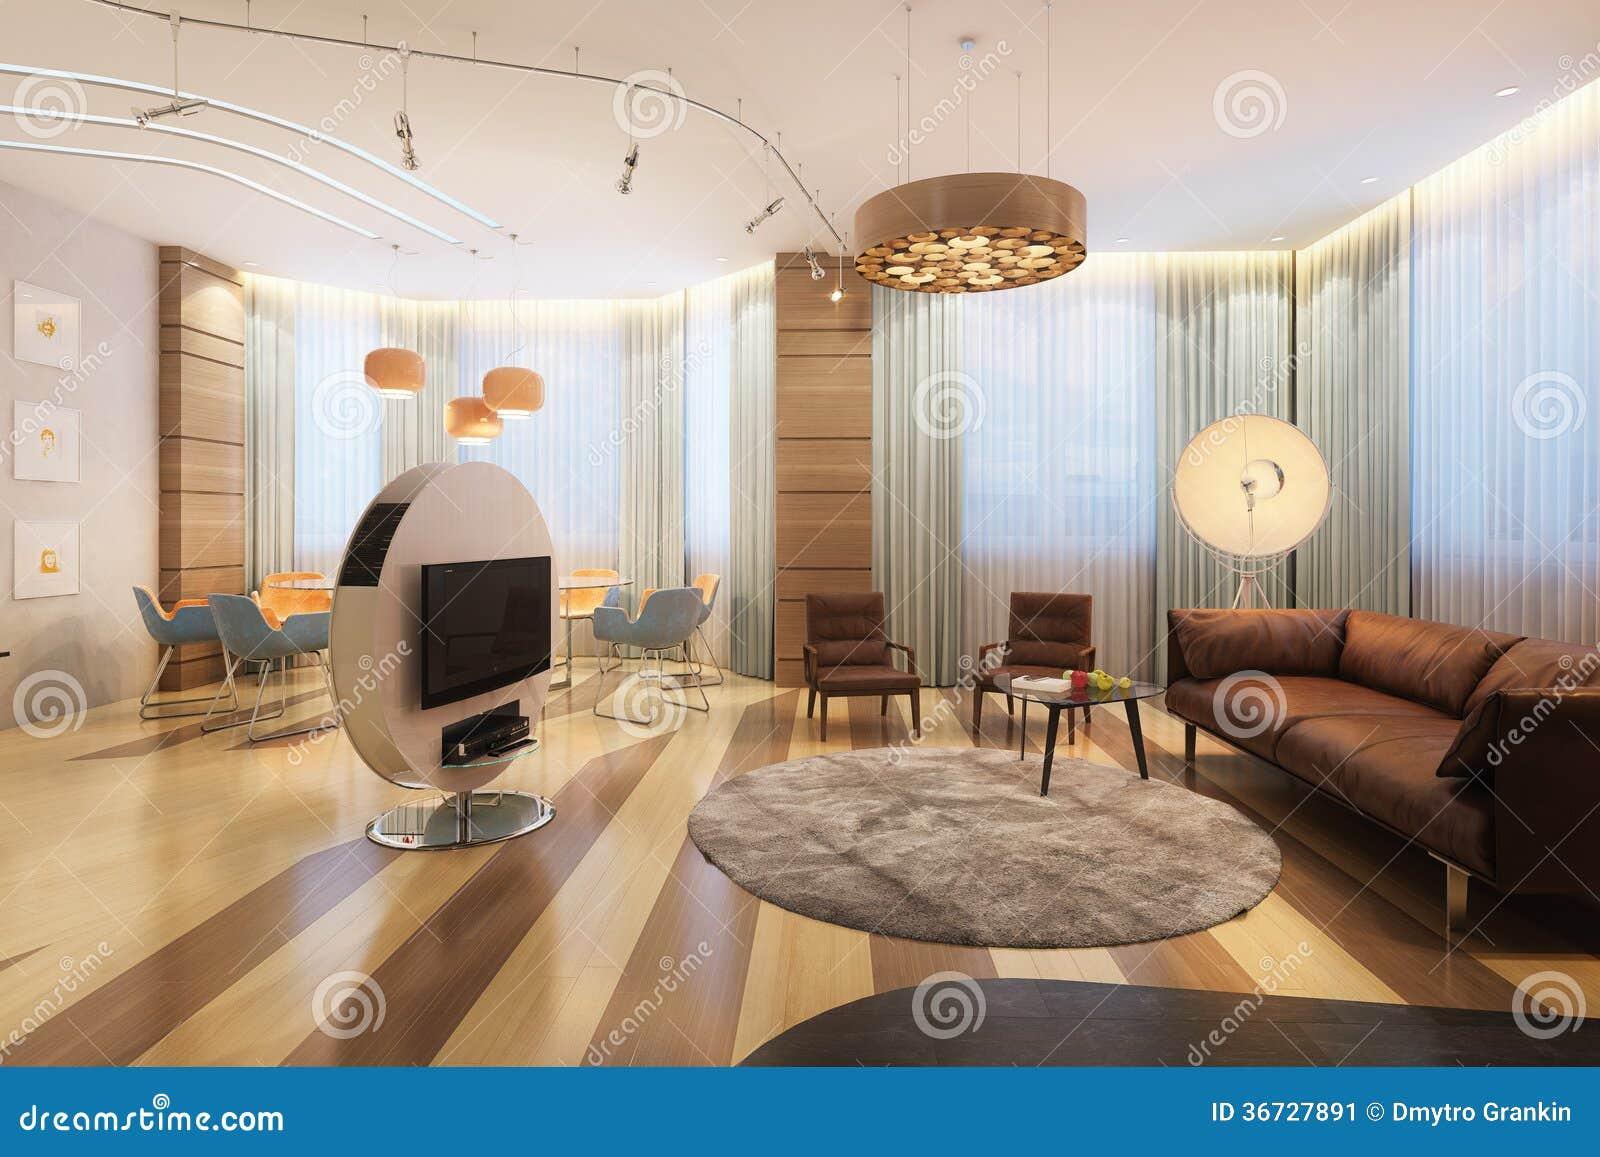 Modern Bathroom Designs Yield Big Returns In Comfort And: Large Luxury Bathroon Stock Image